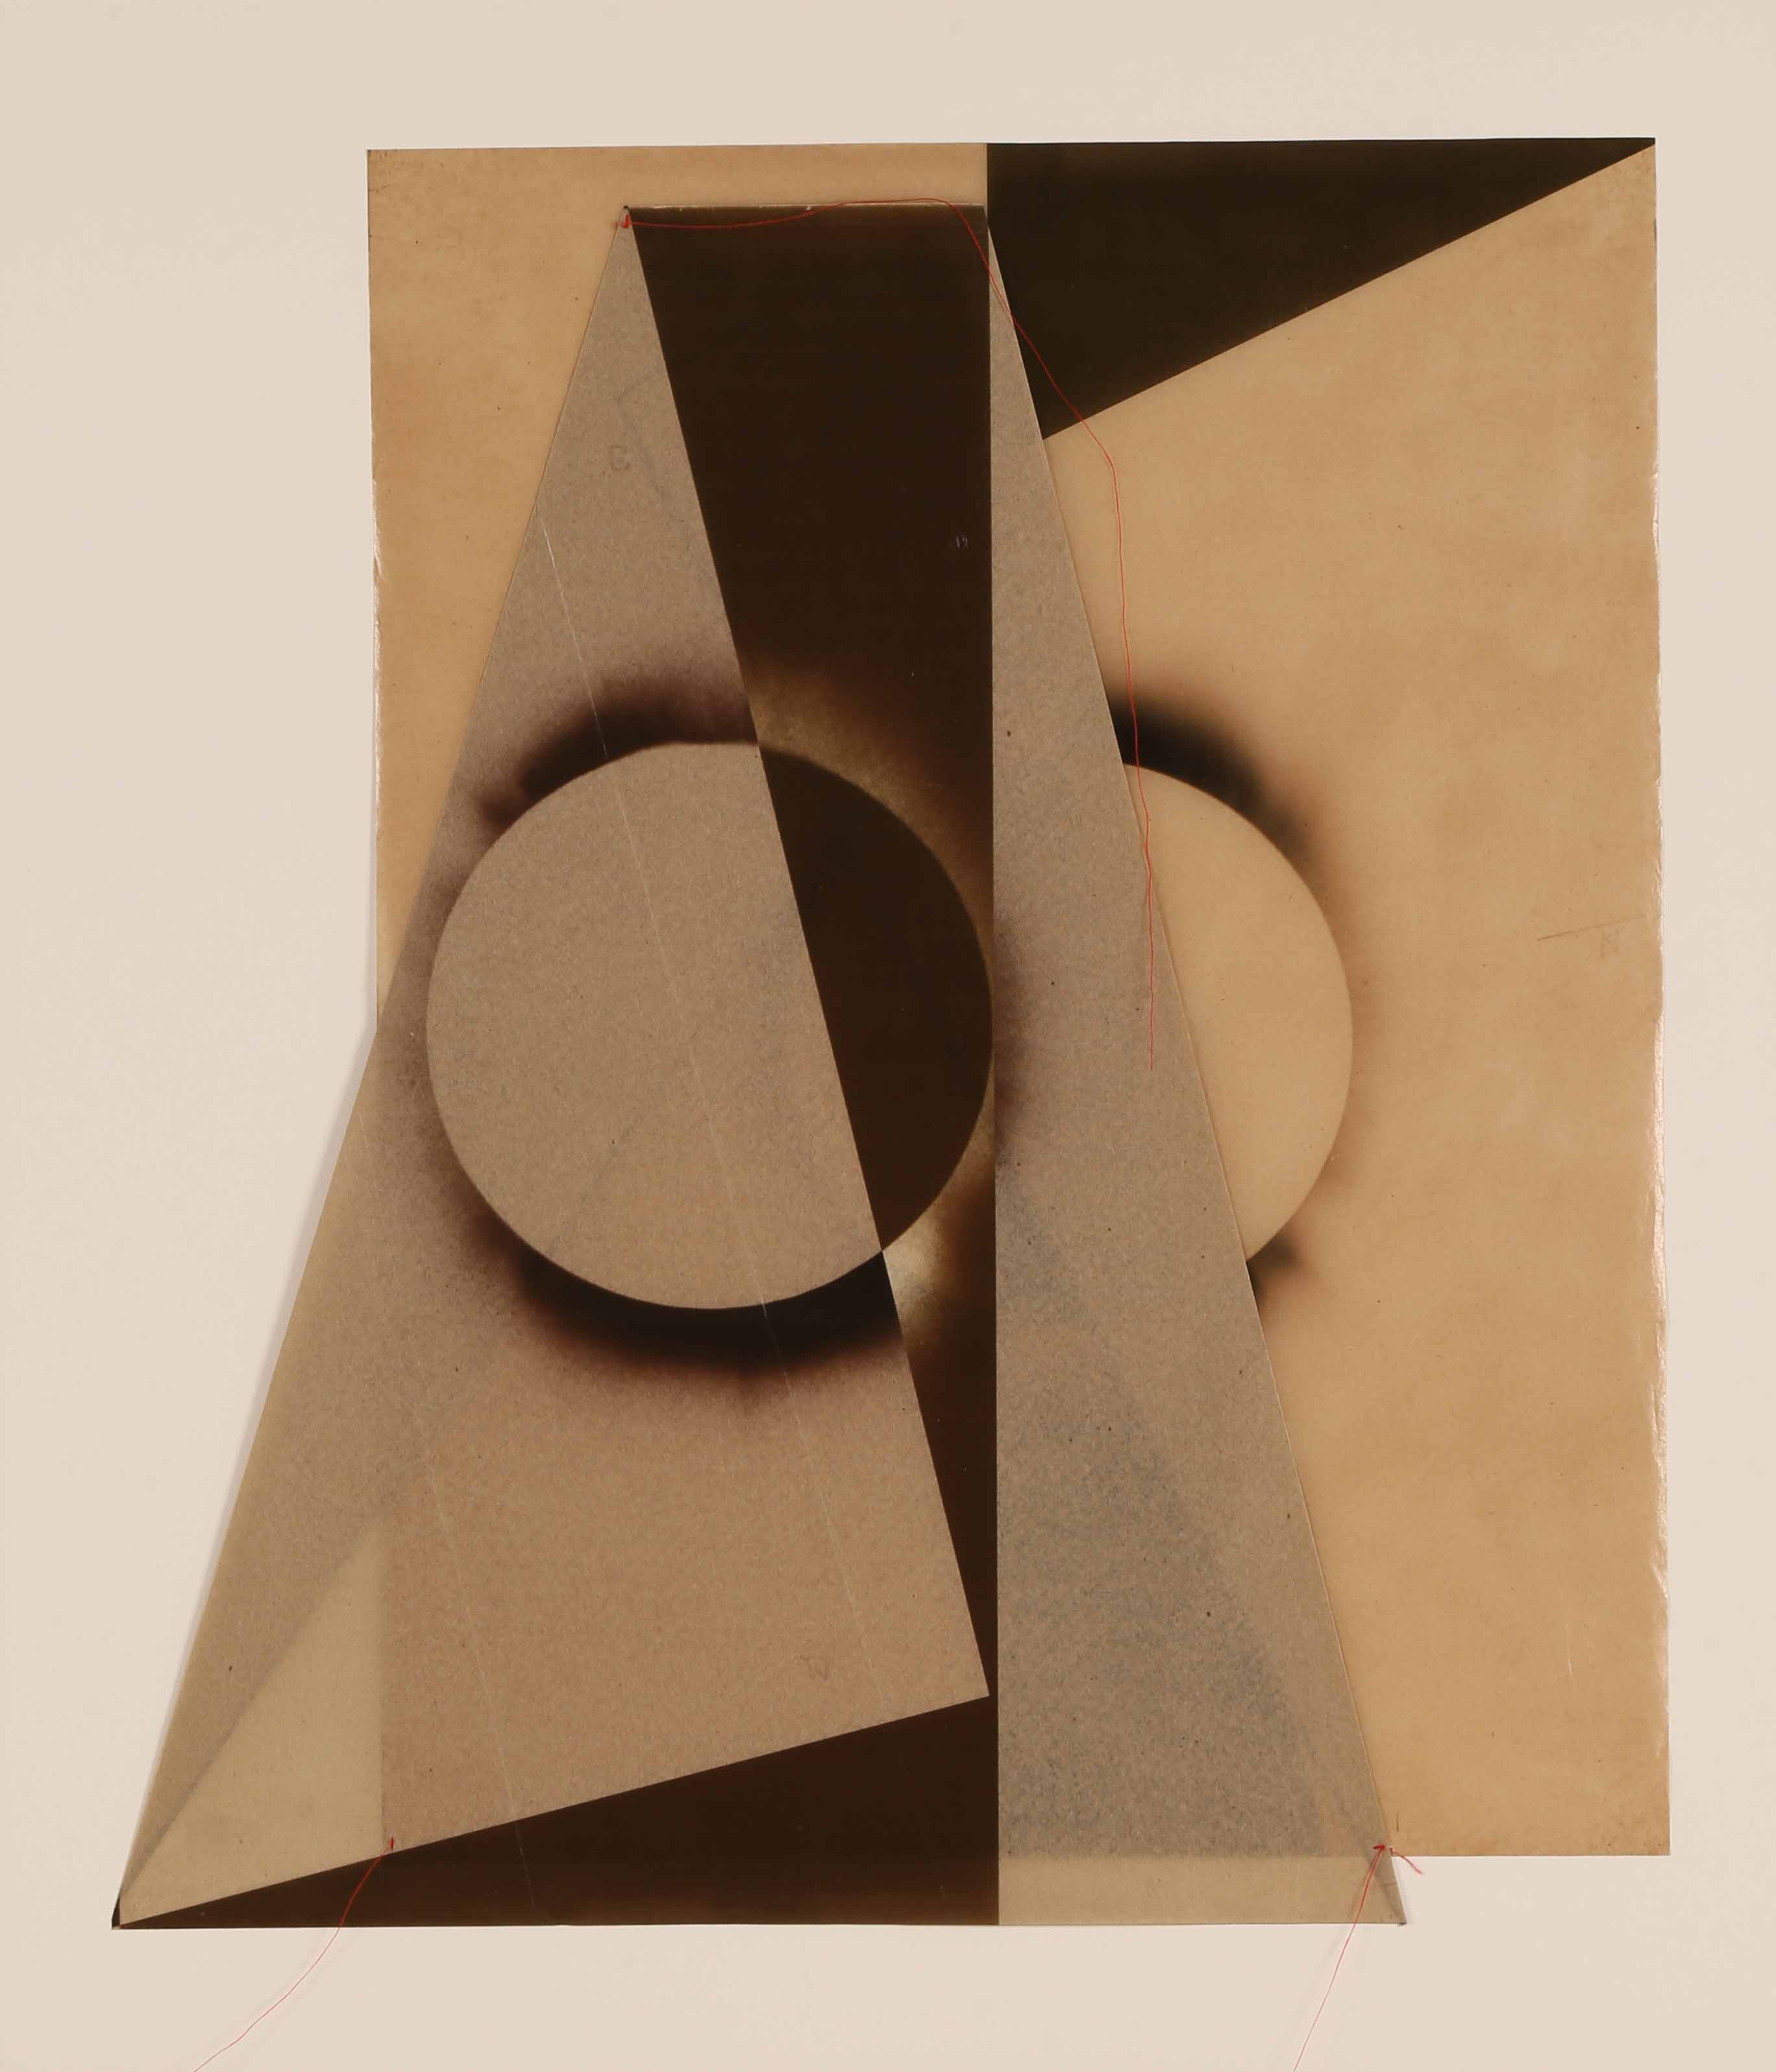 El Sol 1, 2016<br/>Impresión digital sobre papel cebolla / Inkjet print on onion paper